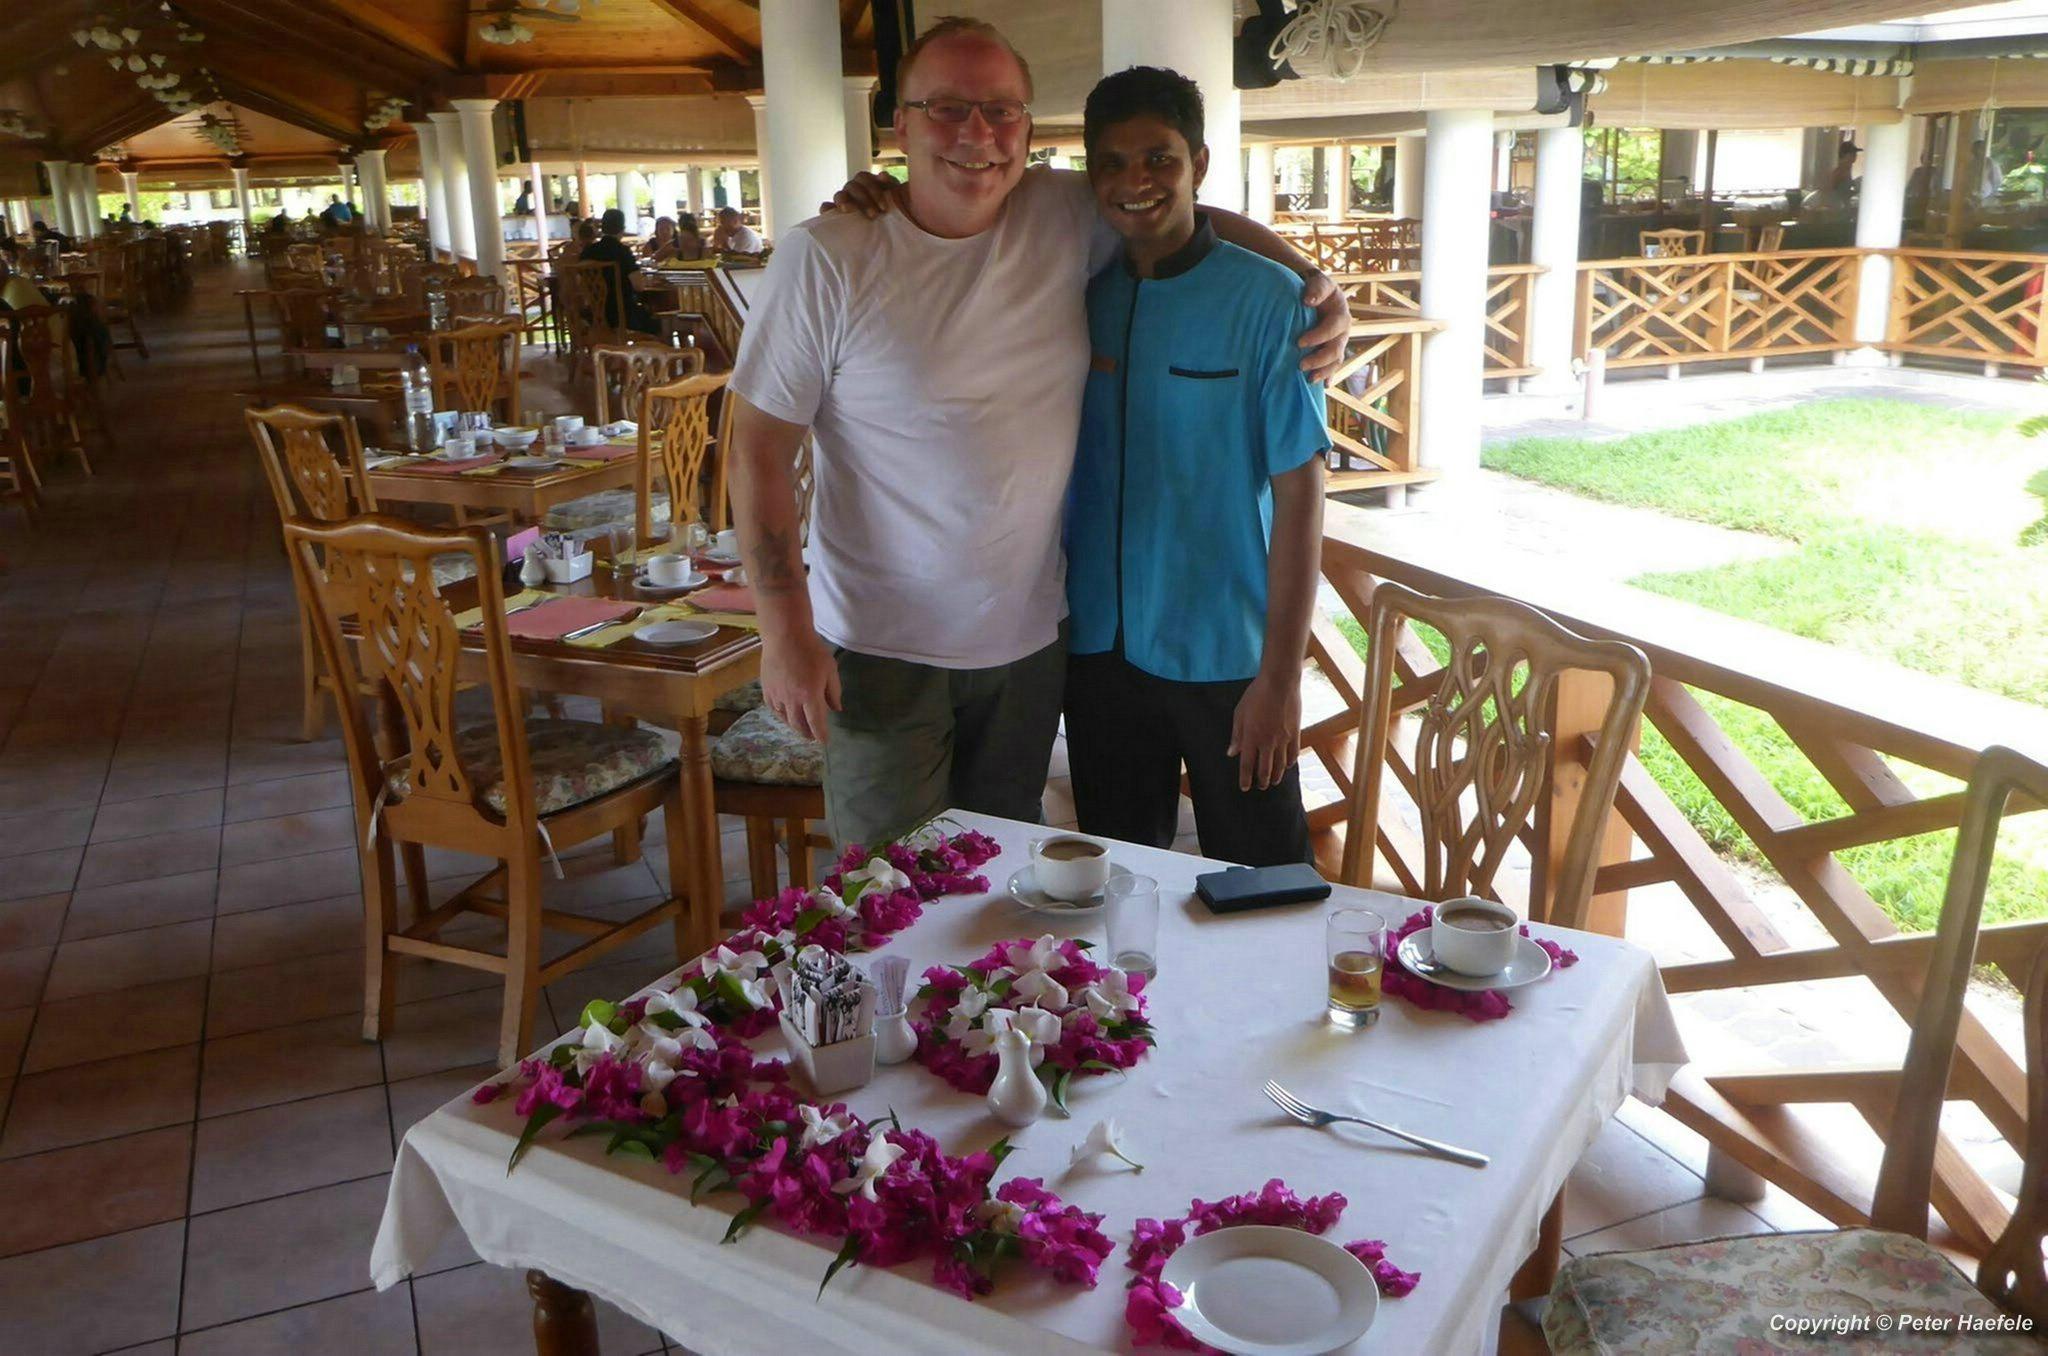 Traumurlaub auf den Malediven, Sun Island, Ari Atoll